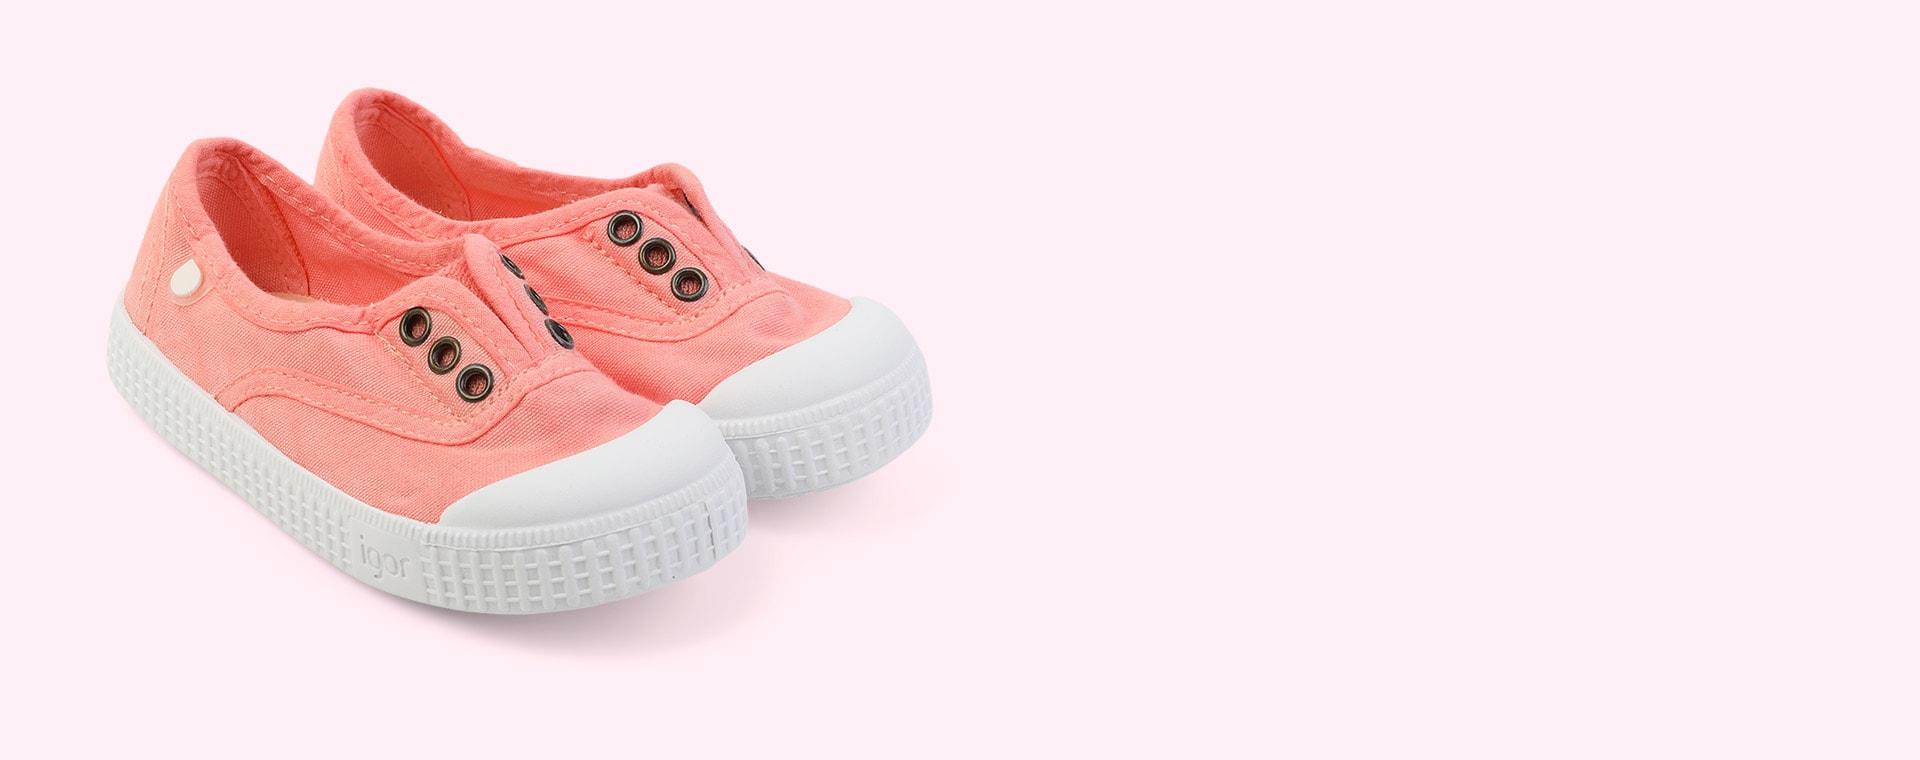 Coral igor Berri Tennis Shoe